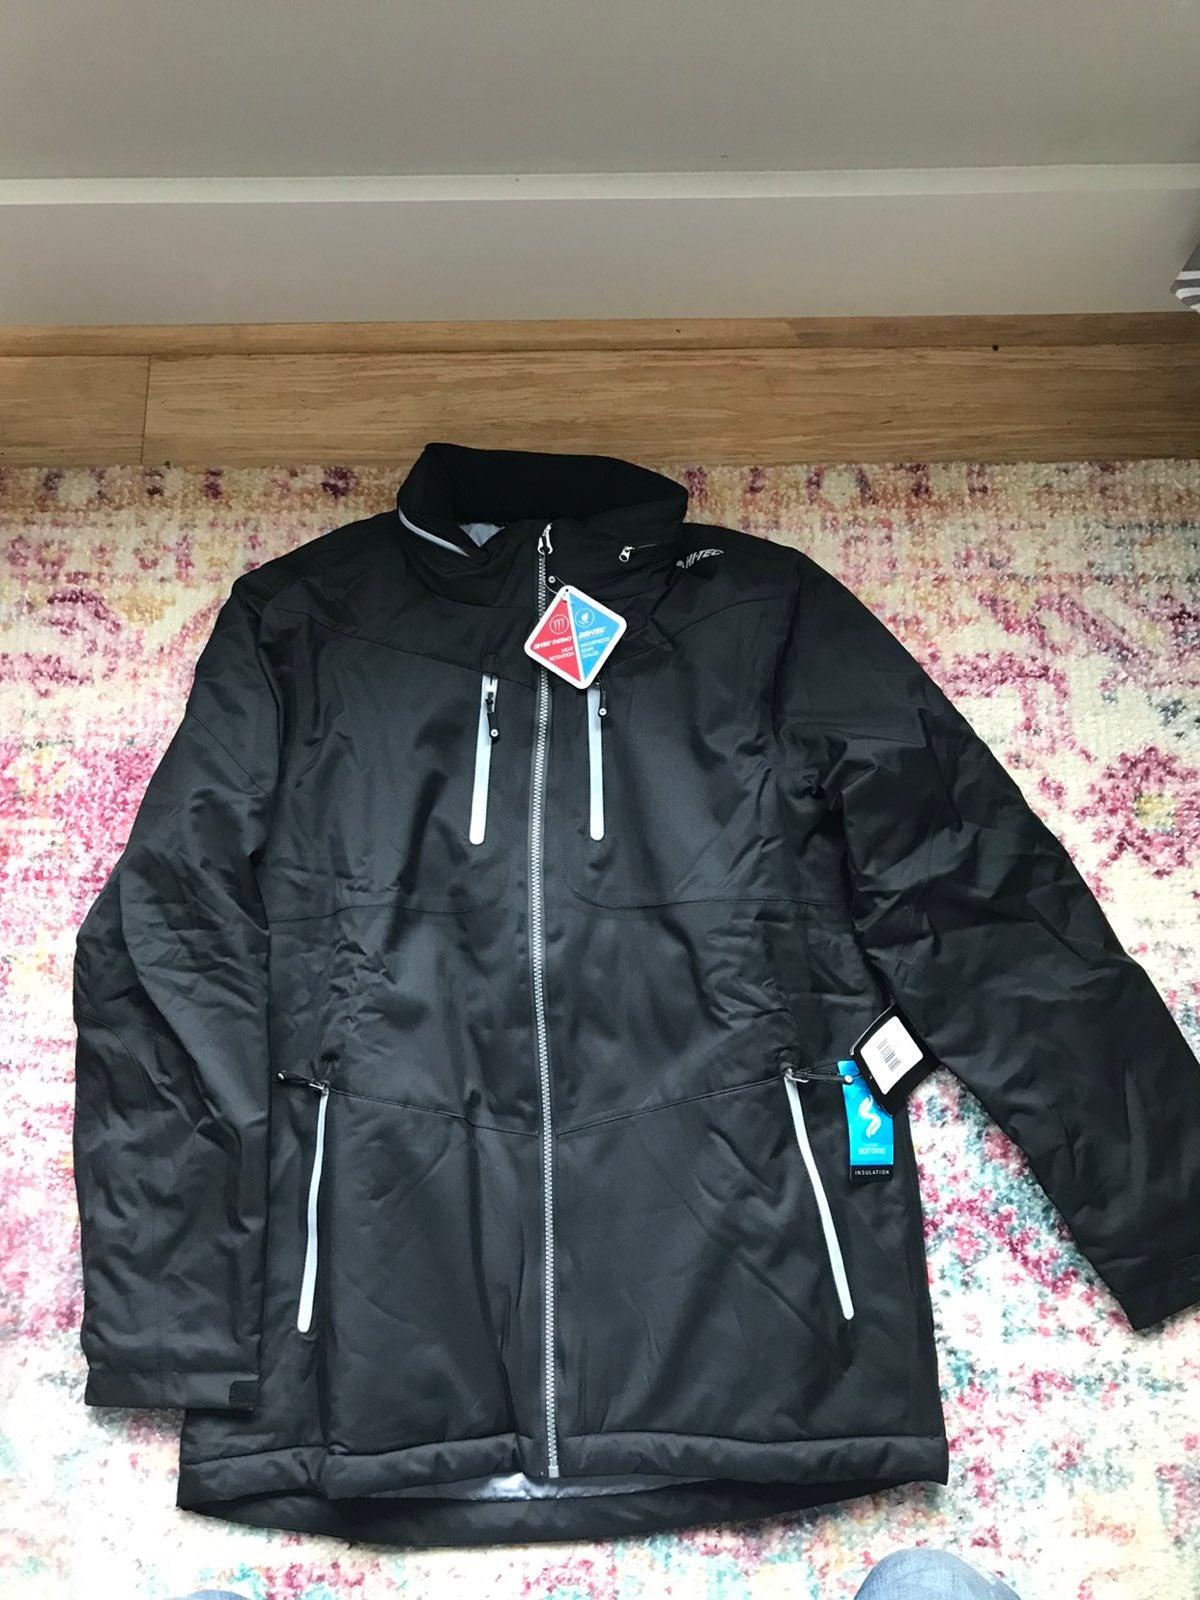 Hi-Tec Dupont Sorona Insulated Jacket